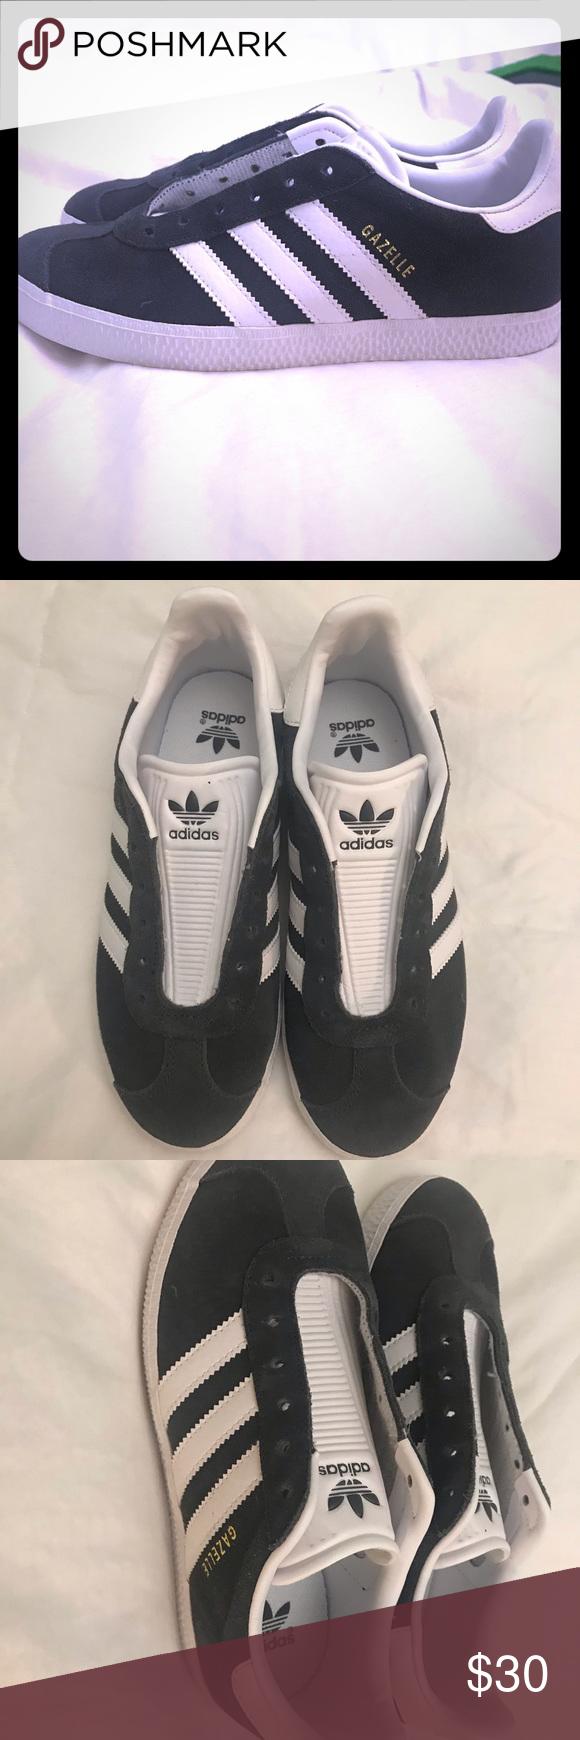 Adidas Boys Gazelle Sneakers size 3.5